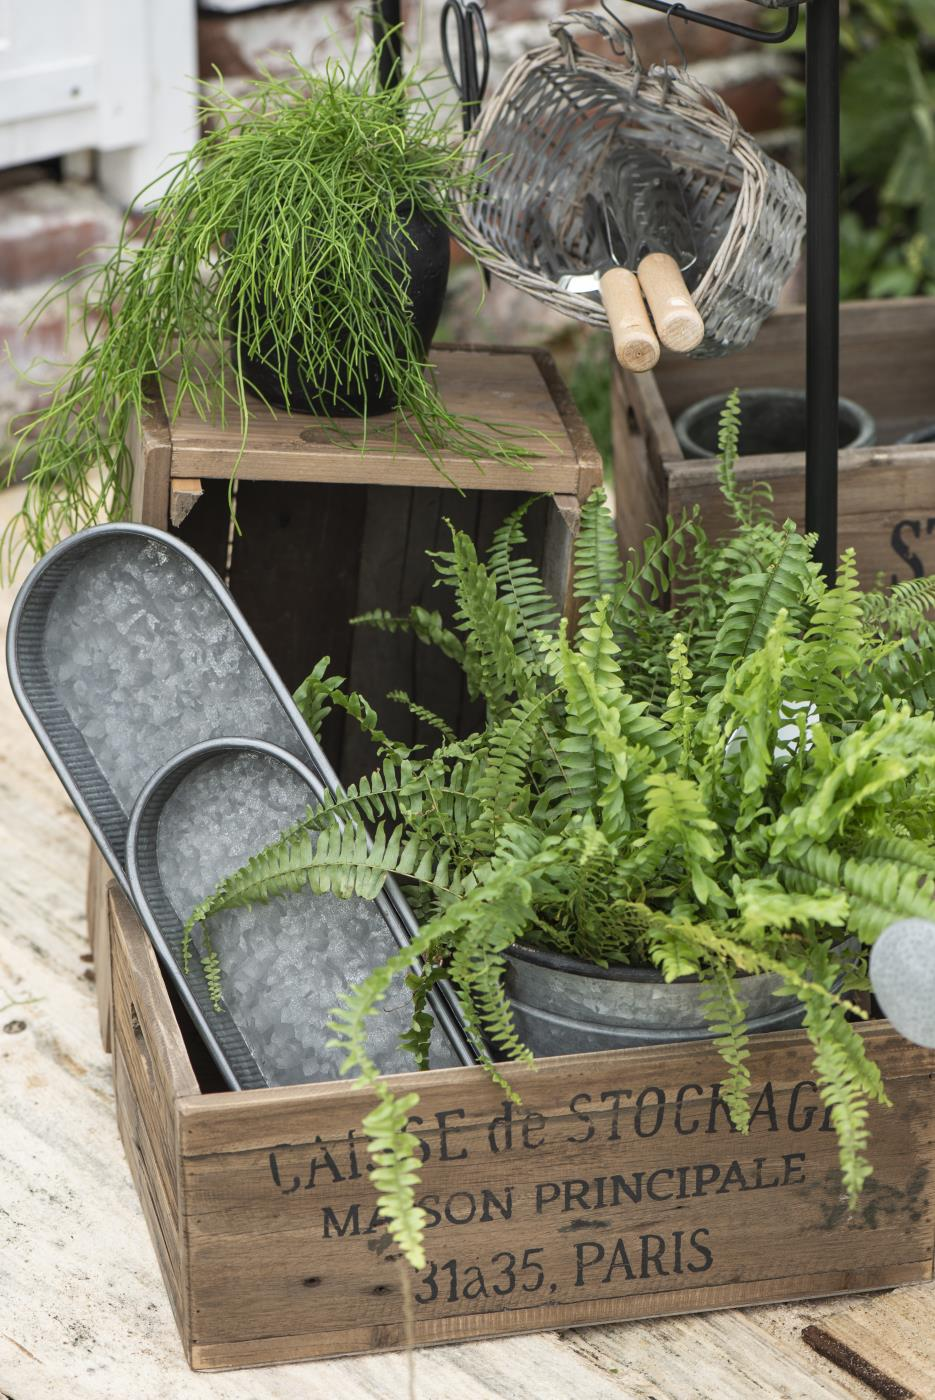 Tablettsatz je 2 m/Rillen Urban Garden ib laursen